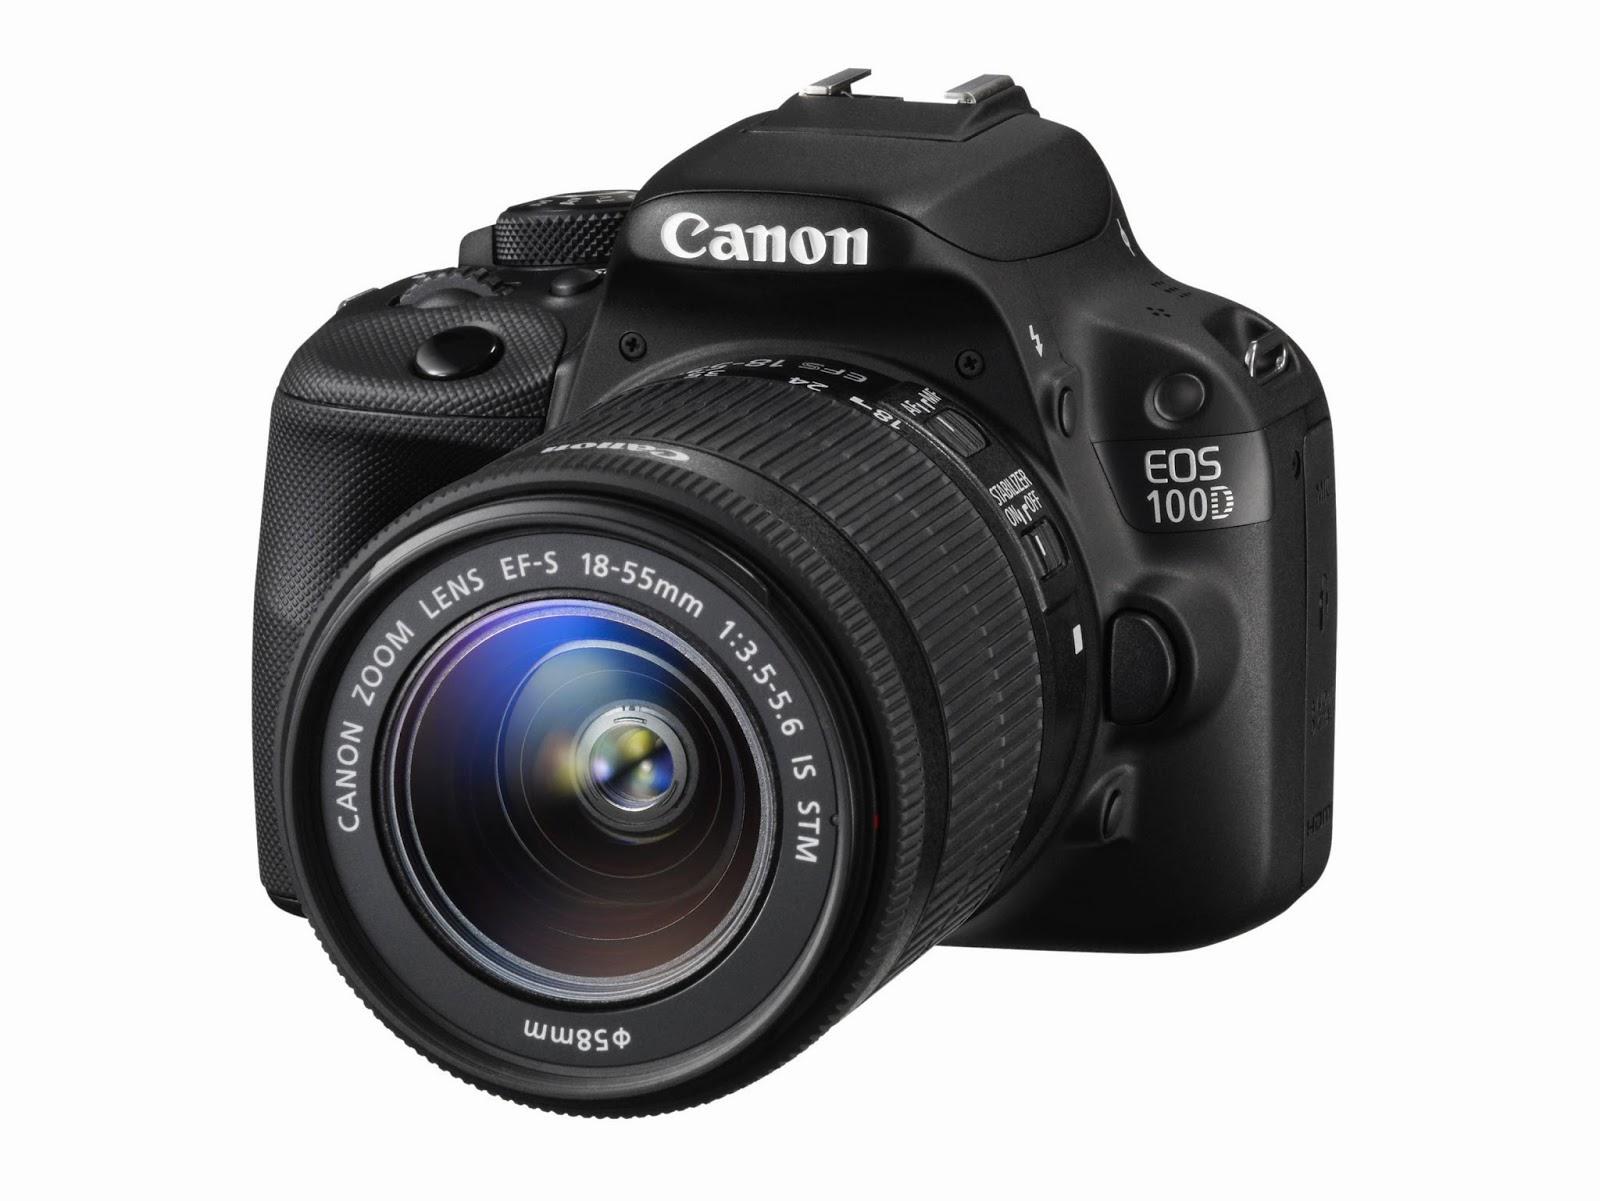 Harga kamera canon eos 100d kit plus spesifikasi terbaru canon eos 100d thecheapjerseys Choice Image